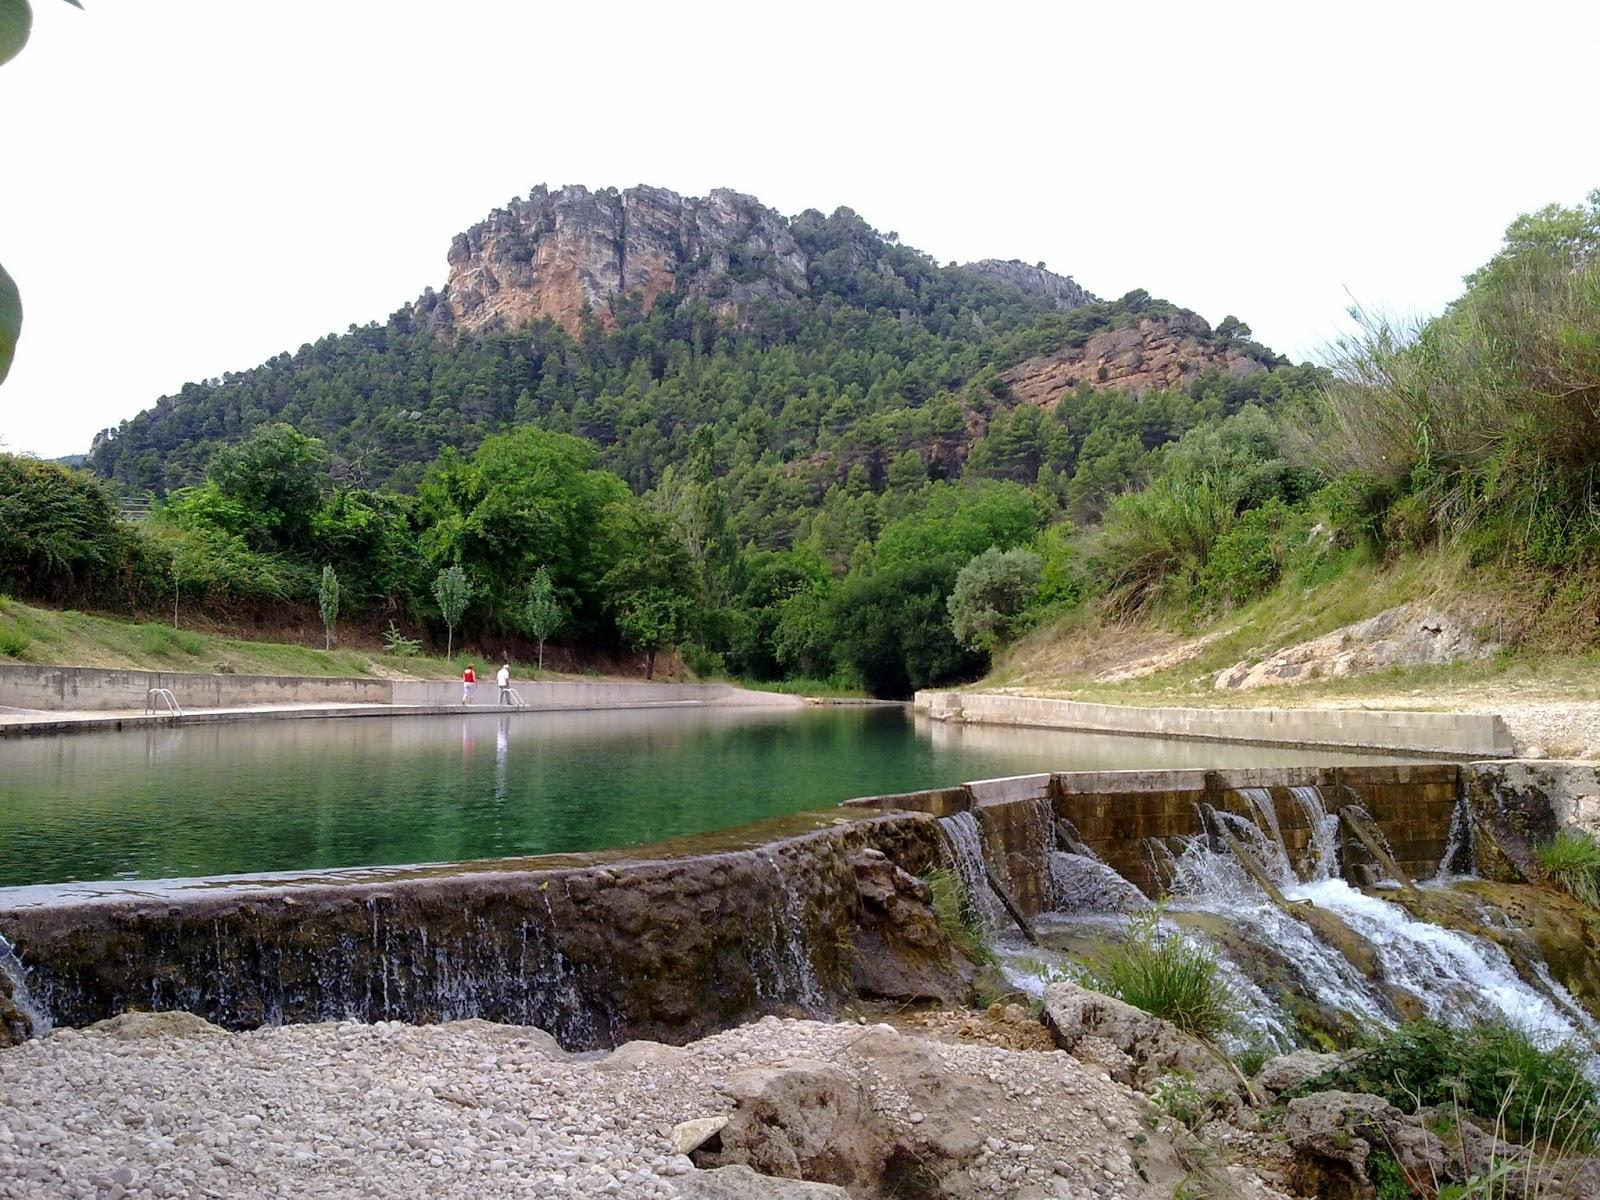 Piscina natural río Matarraña cerca de nuestros apartamentos